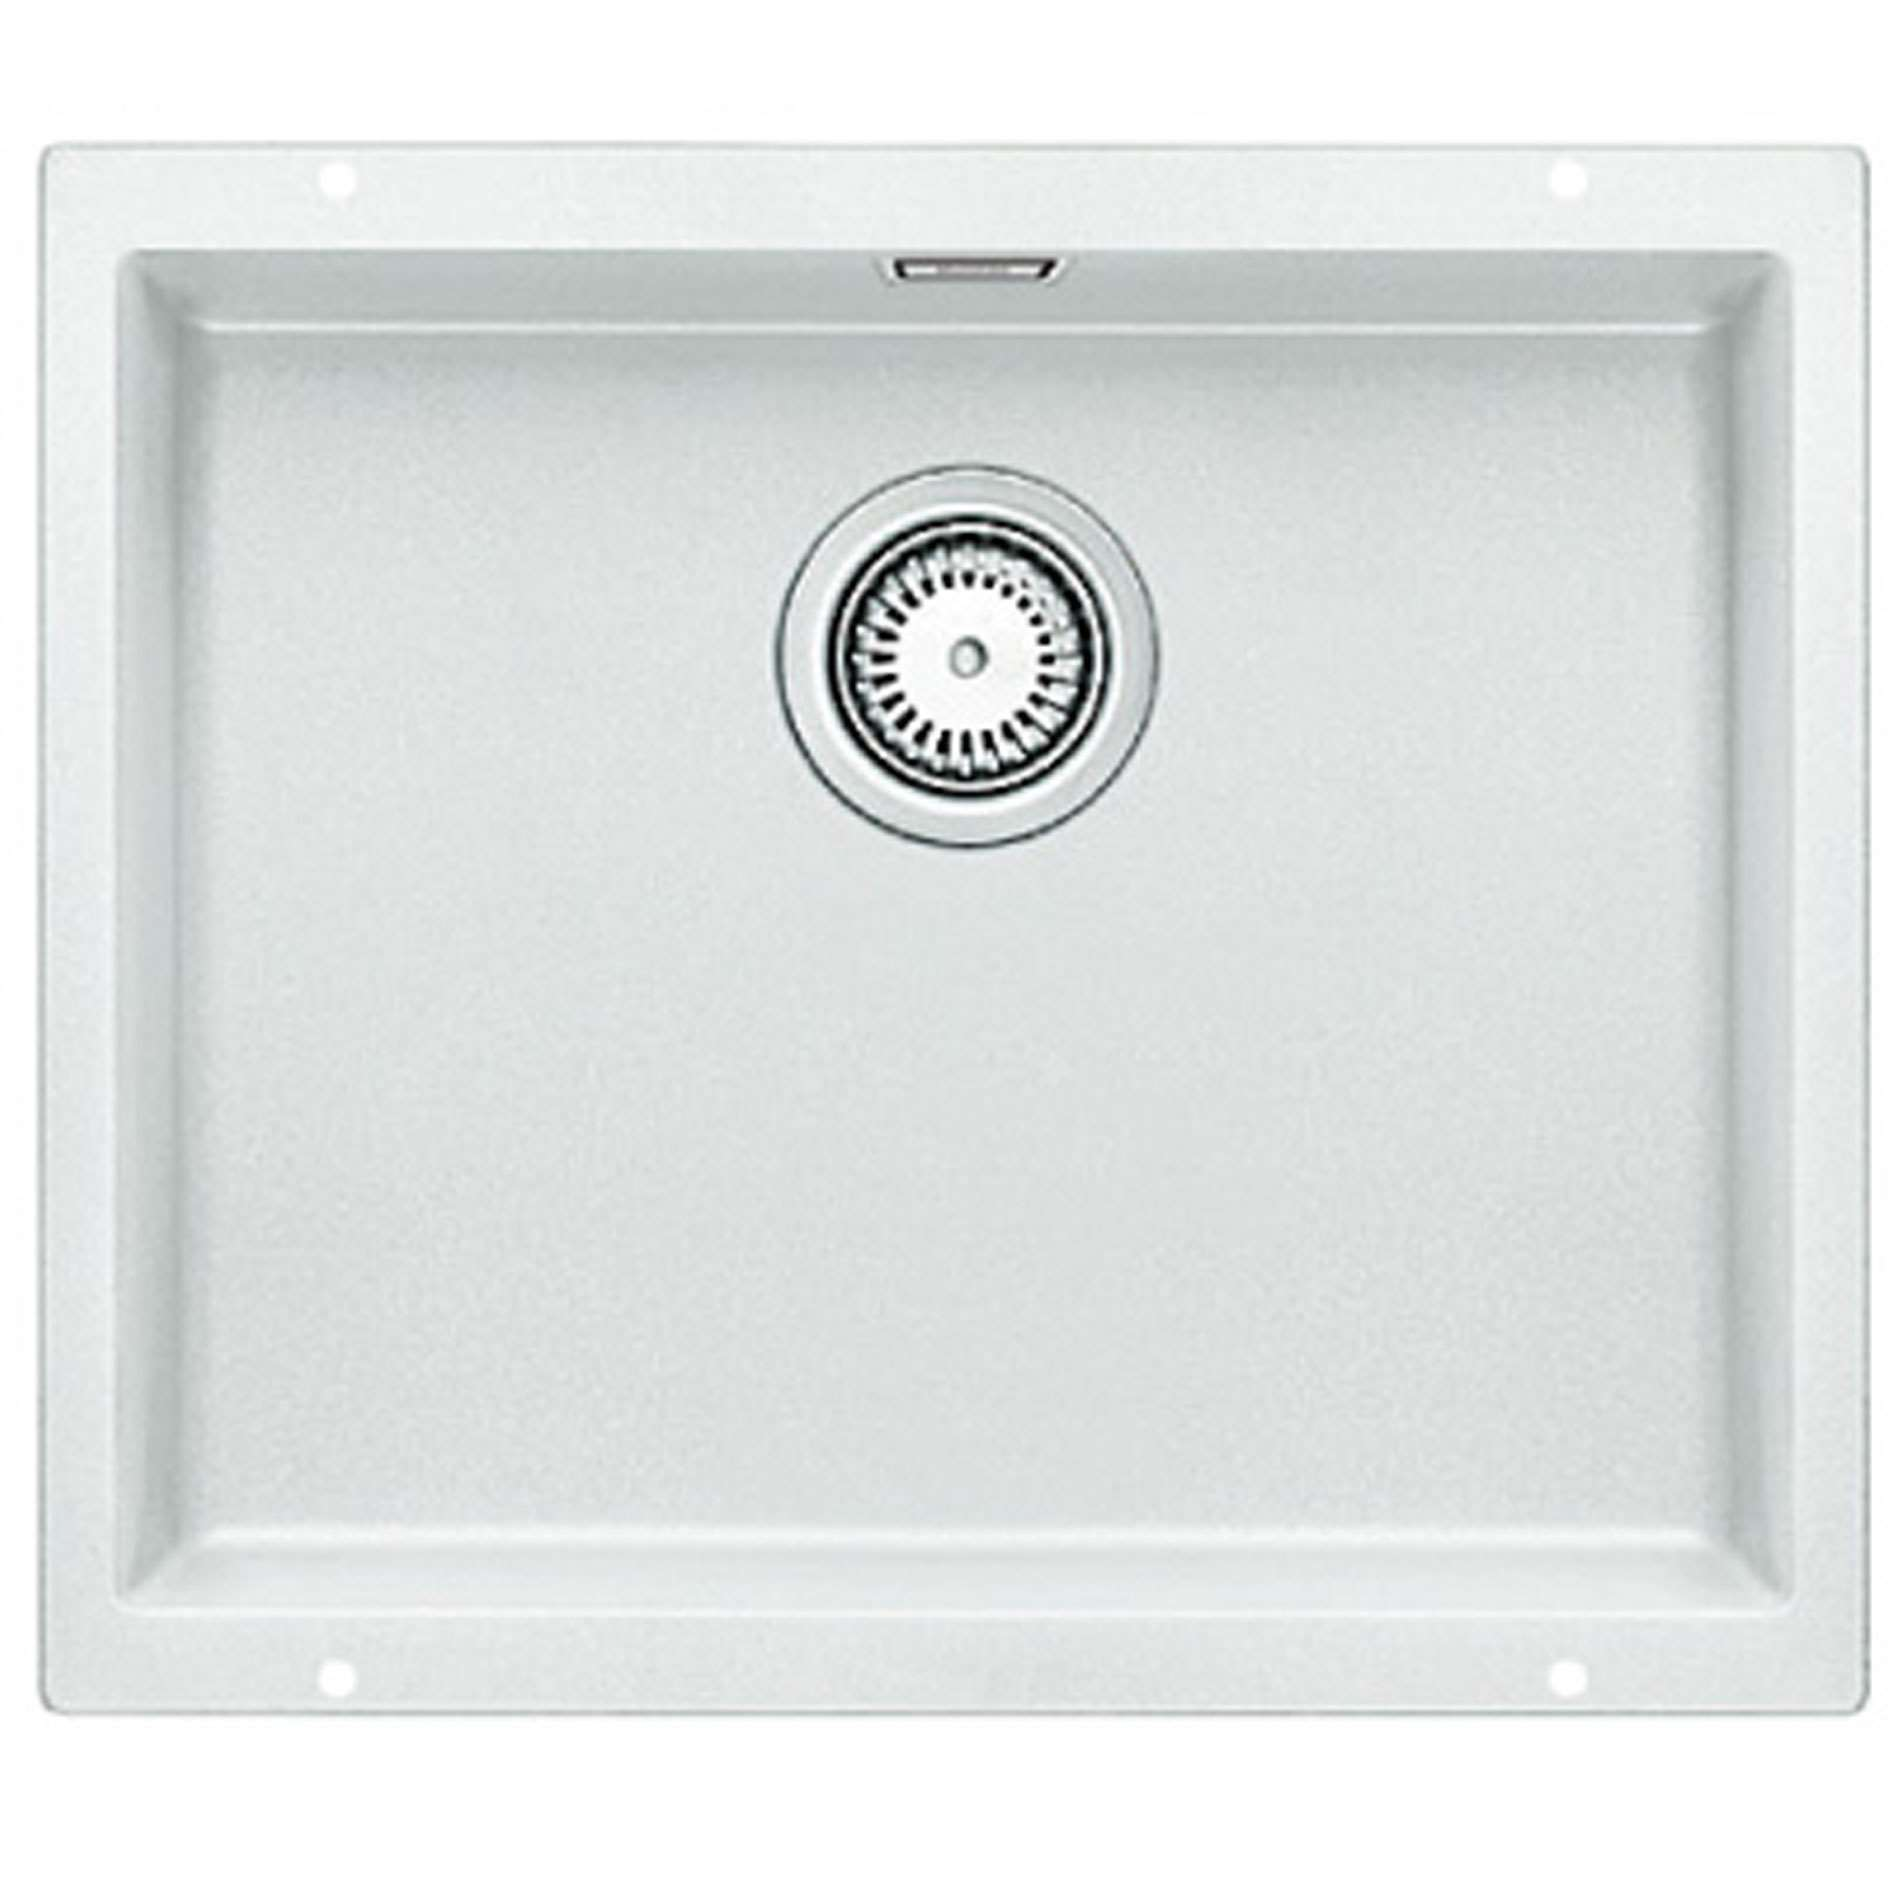 blanco subline 500 u white silgranit sink kitchen sinks taps. Black Bedroom Furniture Sets. Home Design Ideas